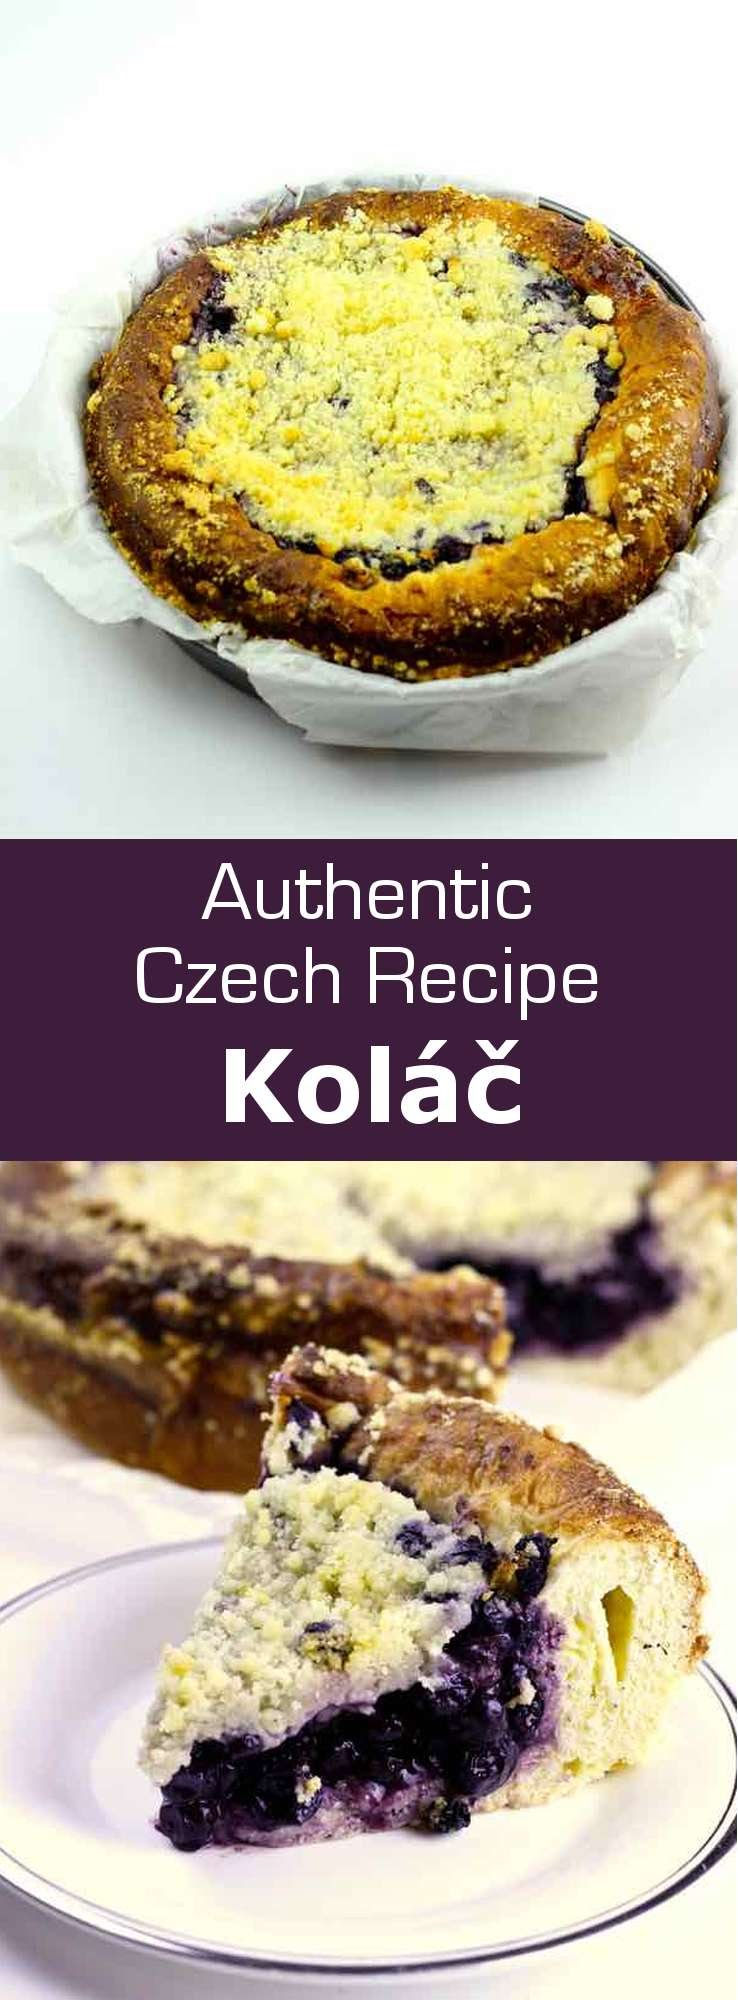 Borůvkový koláč is a version of the popular traditional Czech dessert, kolache, which is more often prepared with poppy seeds, cheese (tvaroh) or jam. #Czech #CzechRepublic #CzechCuisine #CzechRecipe #Cake #CakeRecipe #CzechCake #CzechDessert #WorldCuisine #196flavors